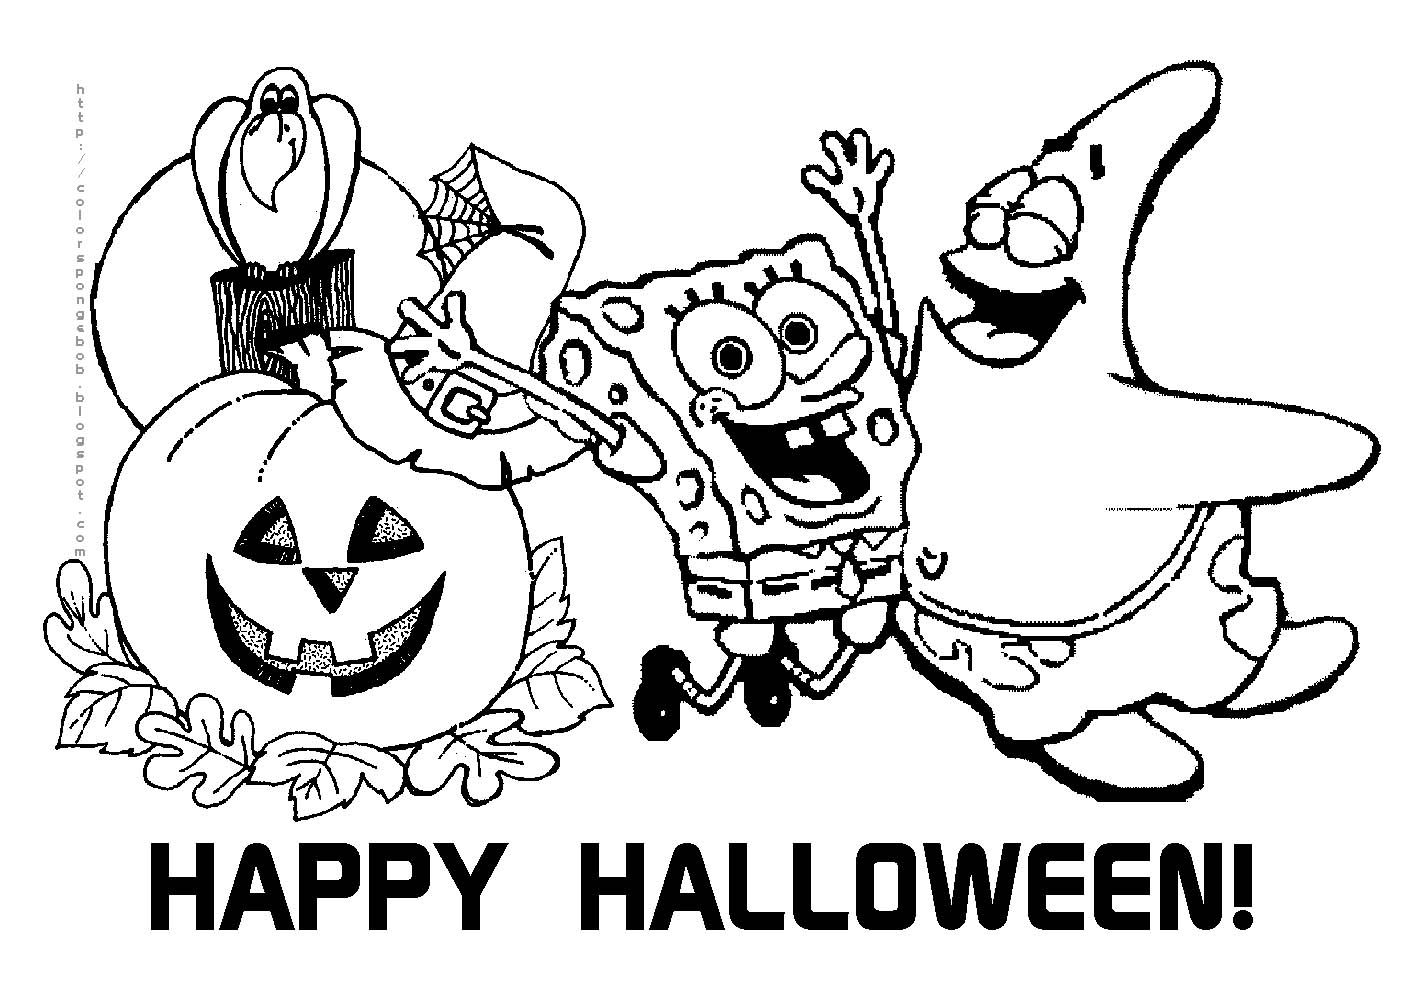 Spongebob Patrick Halloween Coloring Page Halloween Coloring Pages Free Halloween Coloring Pages Halloween Coloring Sheets